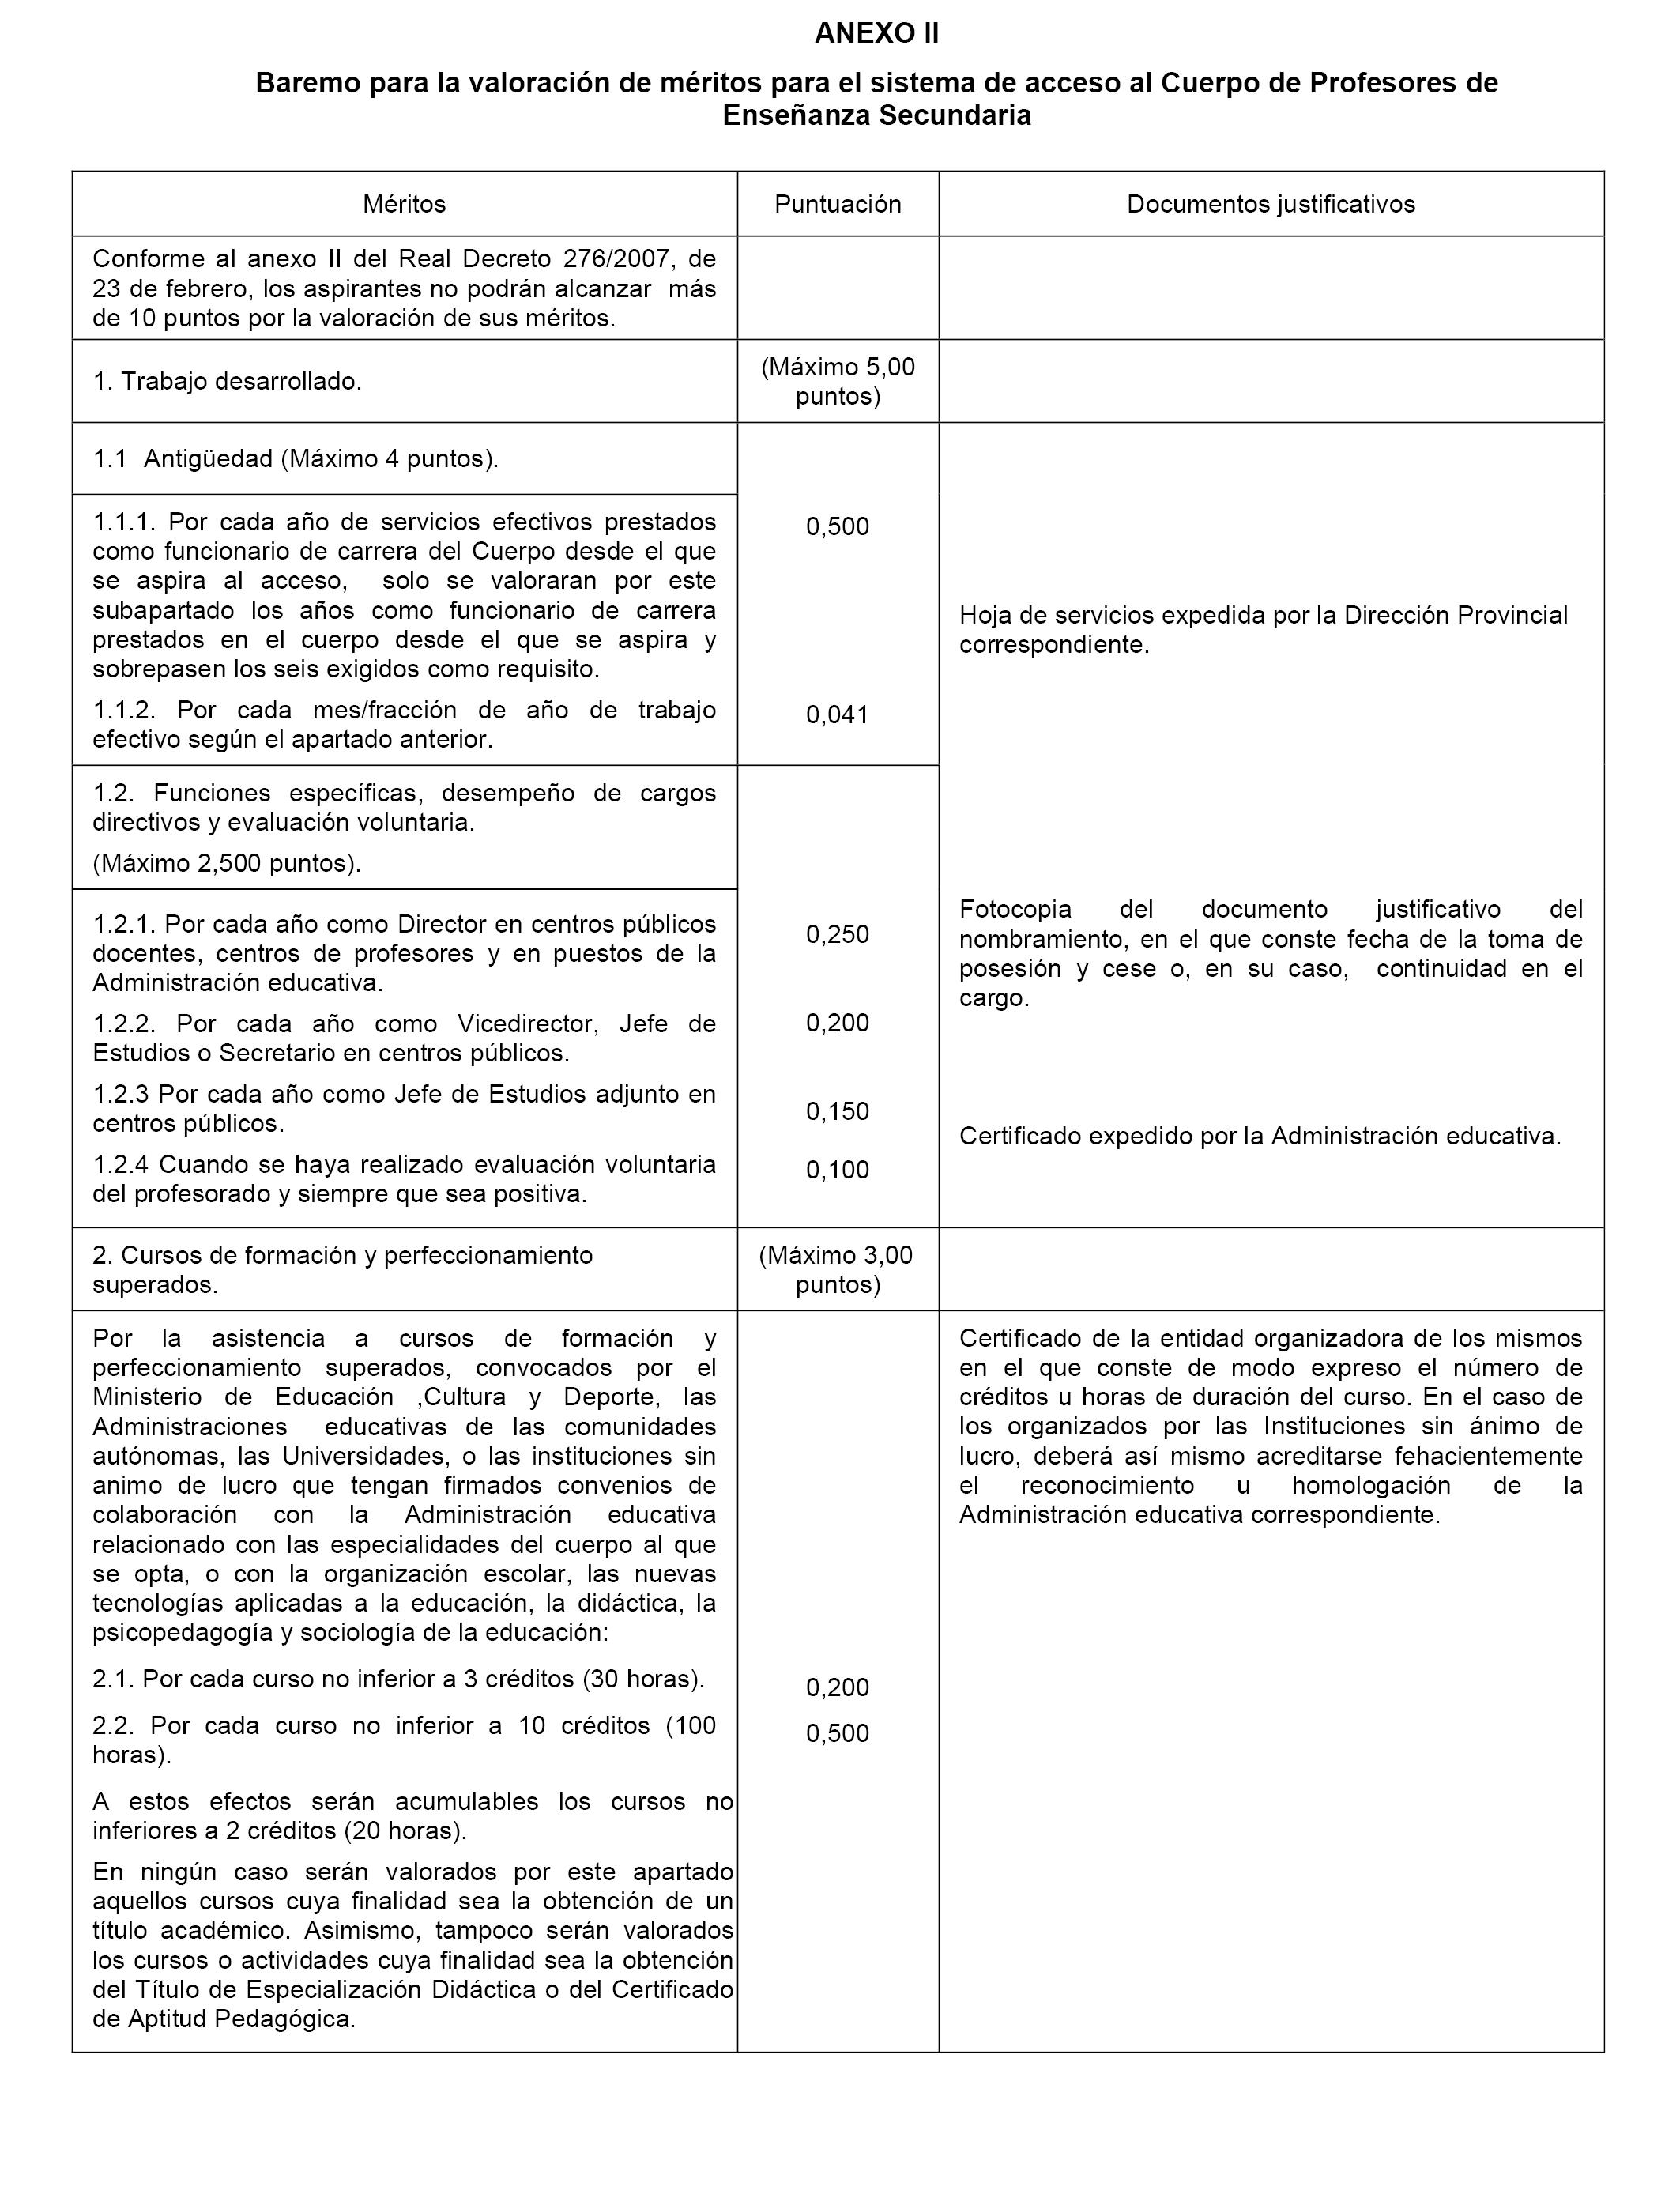 BOE.es - Documento BOE-A-2018-4696